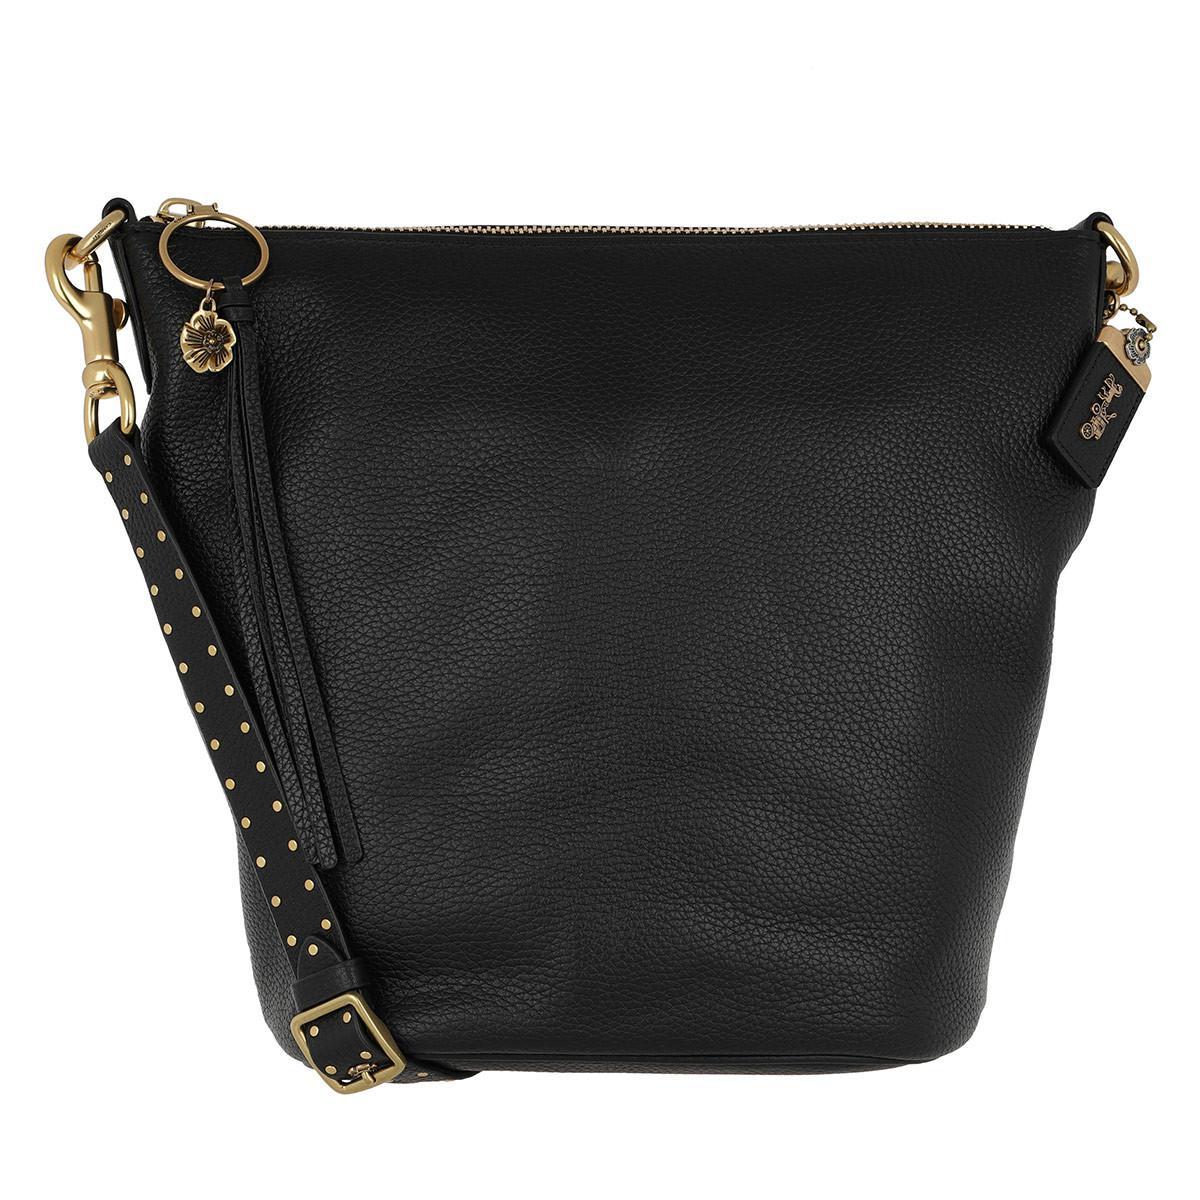 ebbc1cdb4 COACH Border Rivets Duffle Bag Black in Black - Lyst